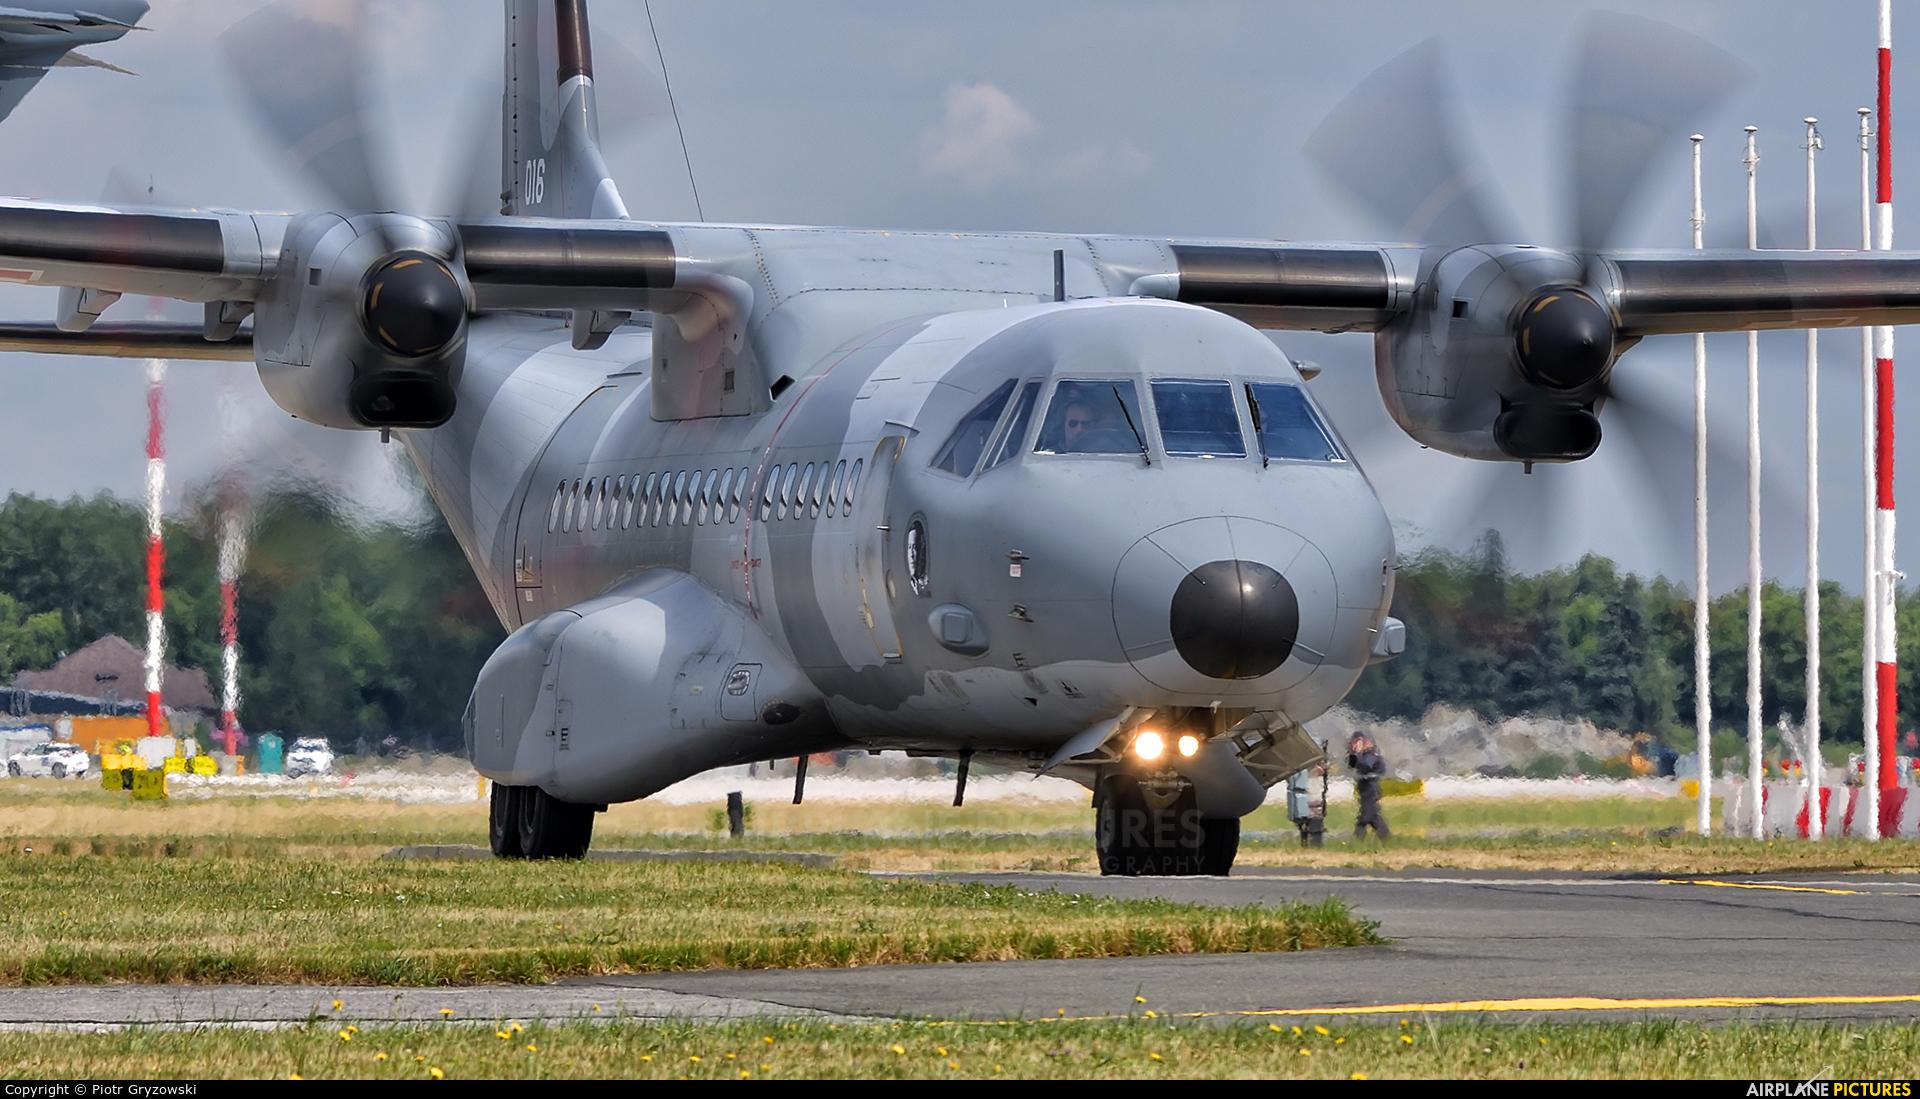 Poland - Air Force 016 aircraft at Kraków - John Paul II Intl